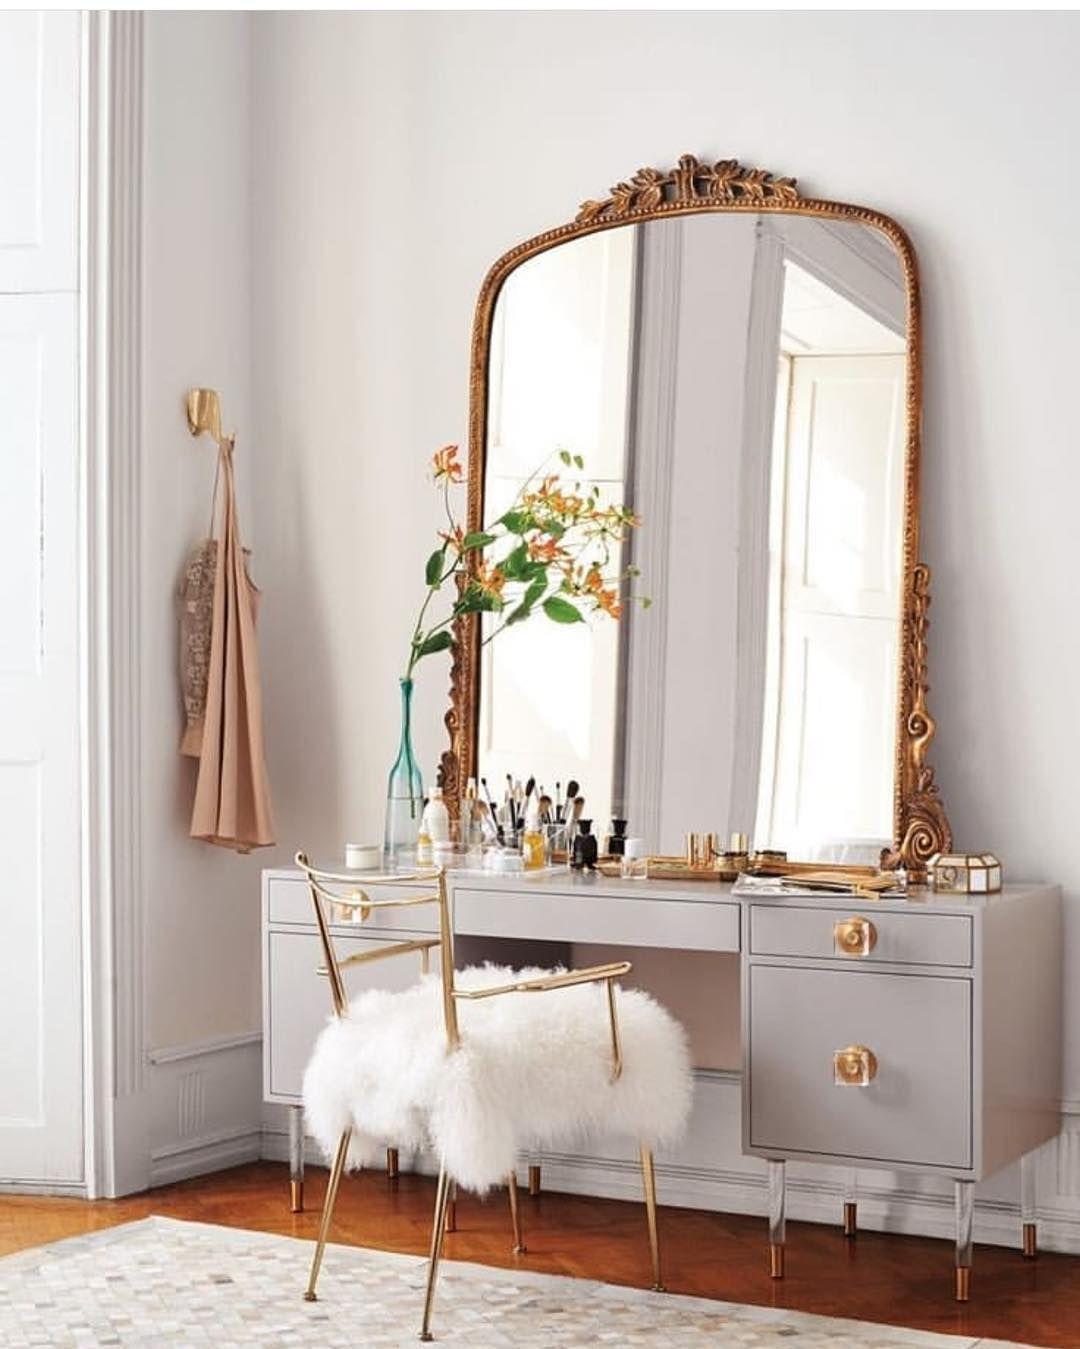 New The 10 Best Home Decor With Pictures تسريحة بسيطة وناعمة بفخاامة Livingroomdecor ه Bedroom Vanity Makeup Table Vanity Decor Interior Design